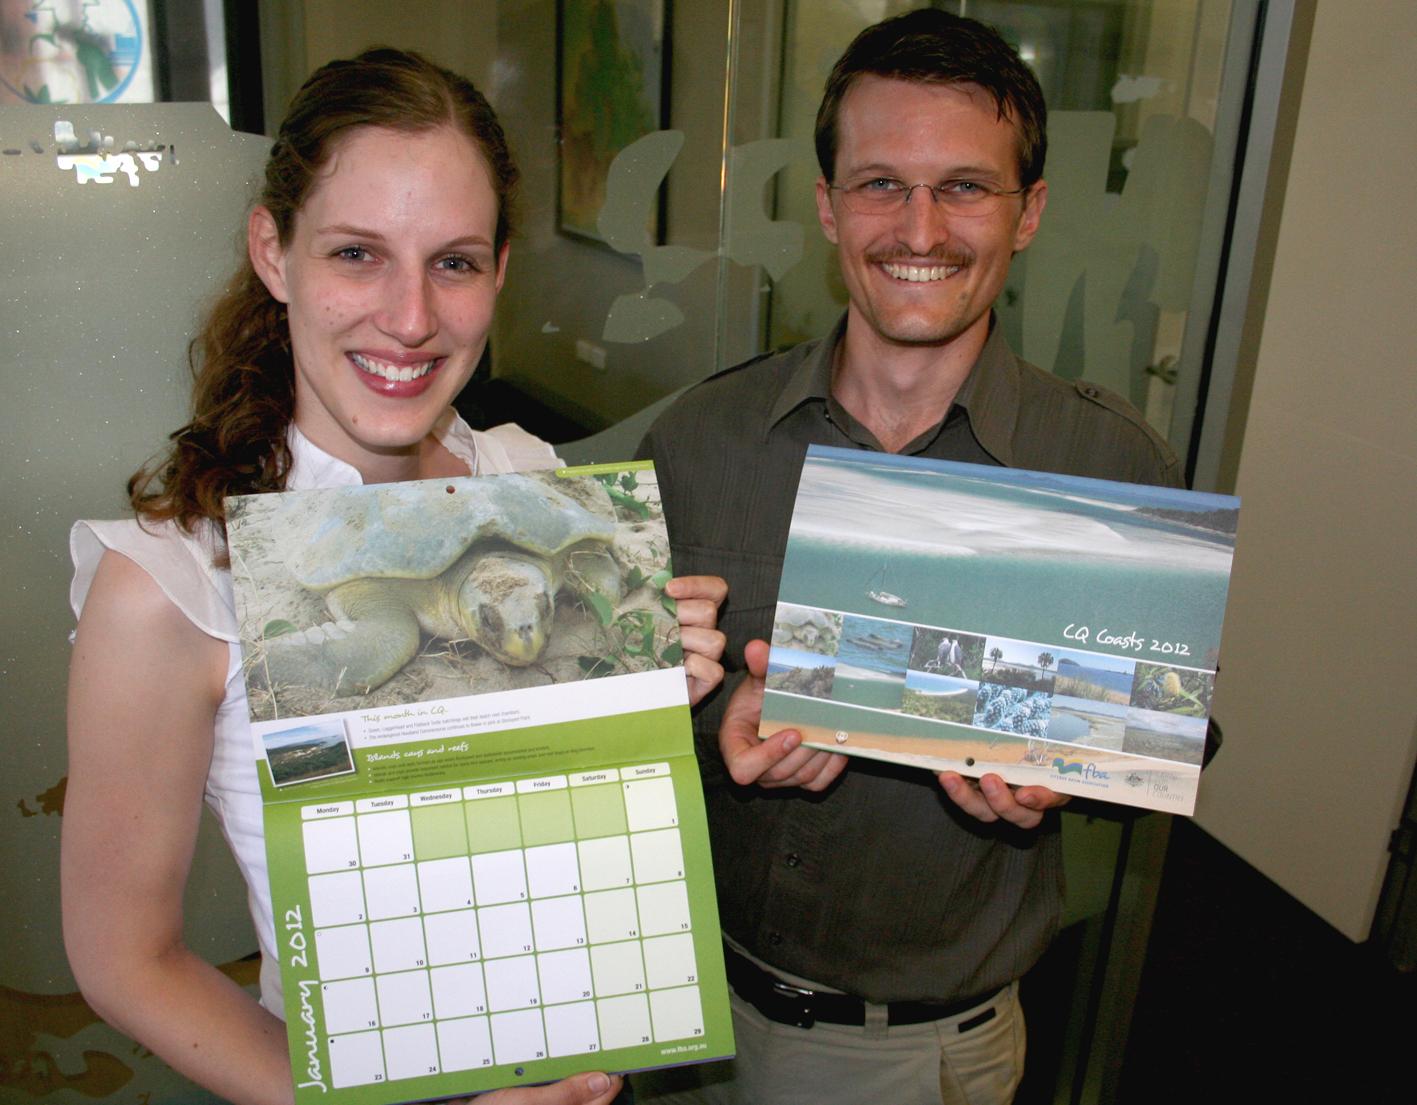 Fitzroy Basin Association Coastal team members Jenna Bishop and Shannon van Nunen with the 2012 calendars.